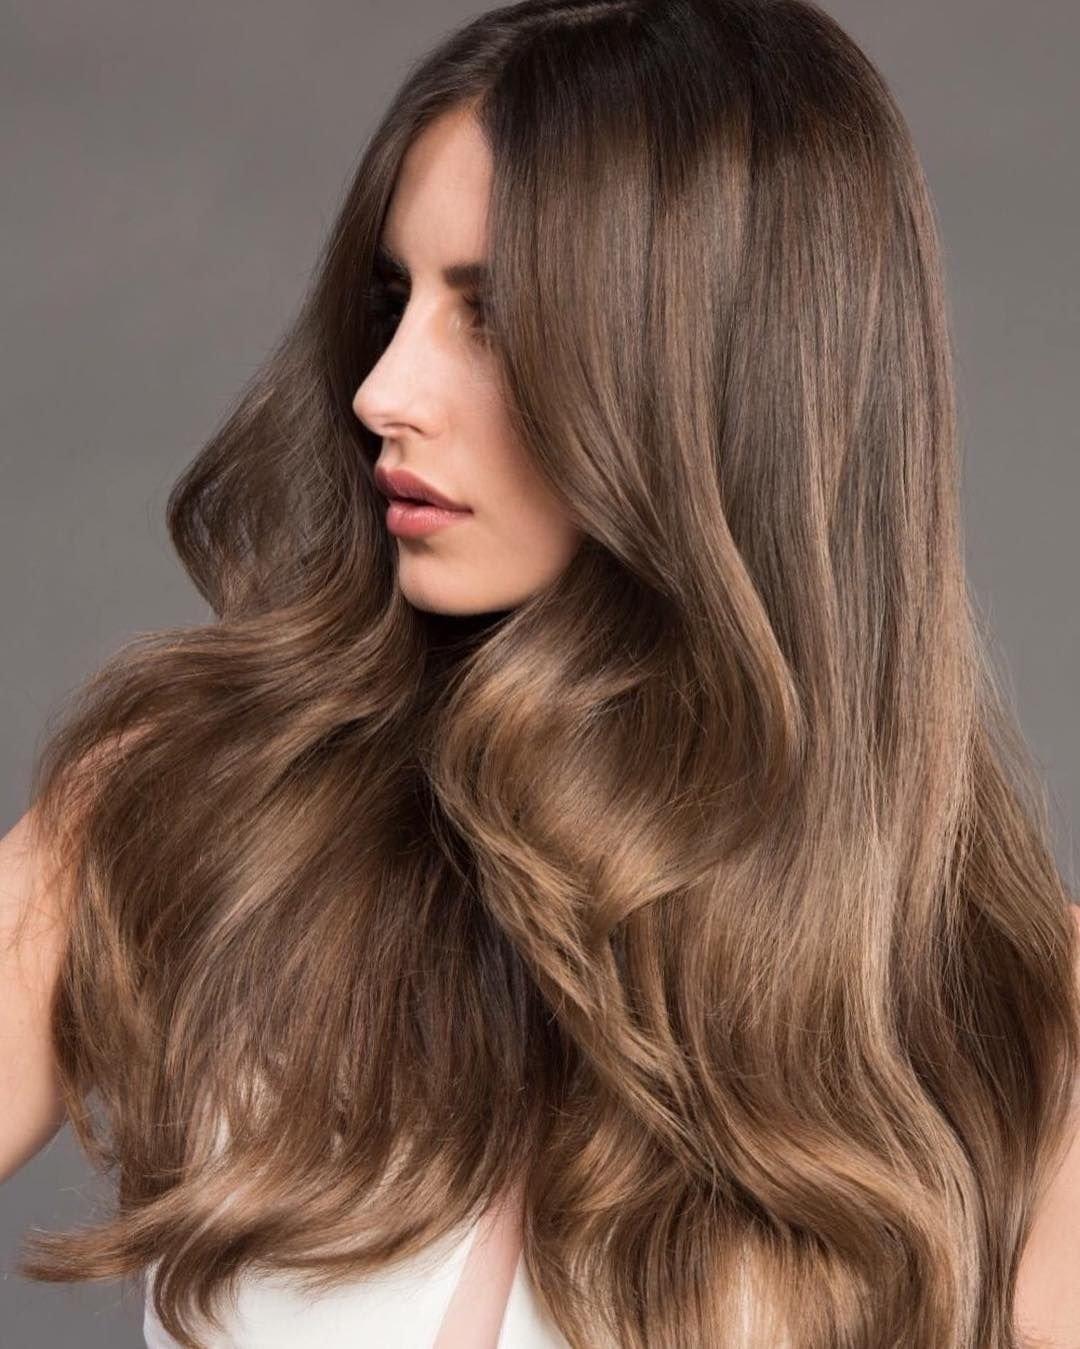 10 Stunning Light Brown Hair Color Ideas 50 alluring dark and light golden brown hair color ideas fall 2016 2020